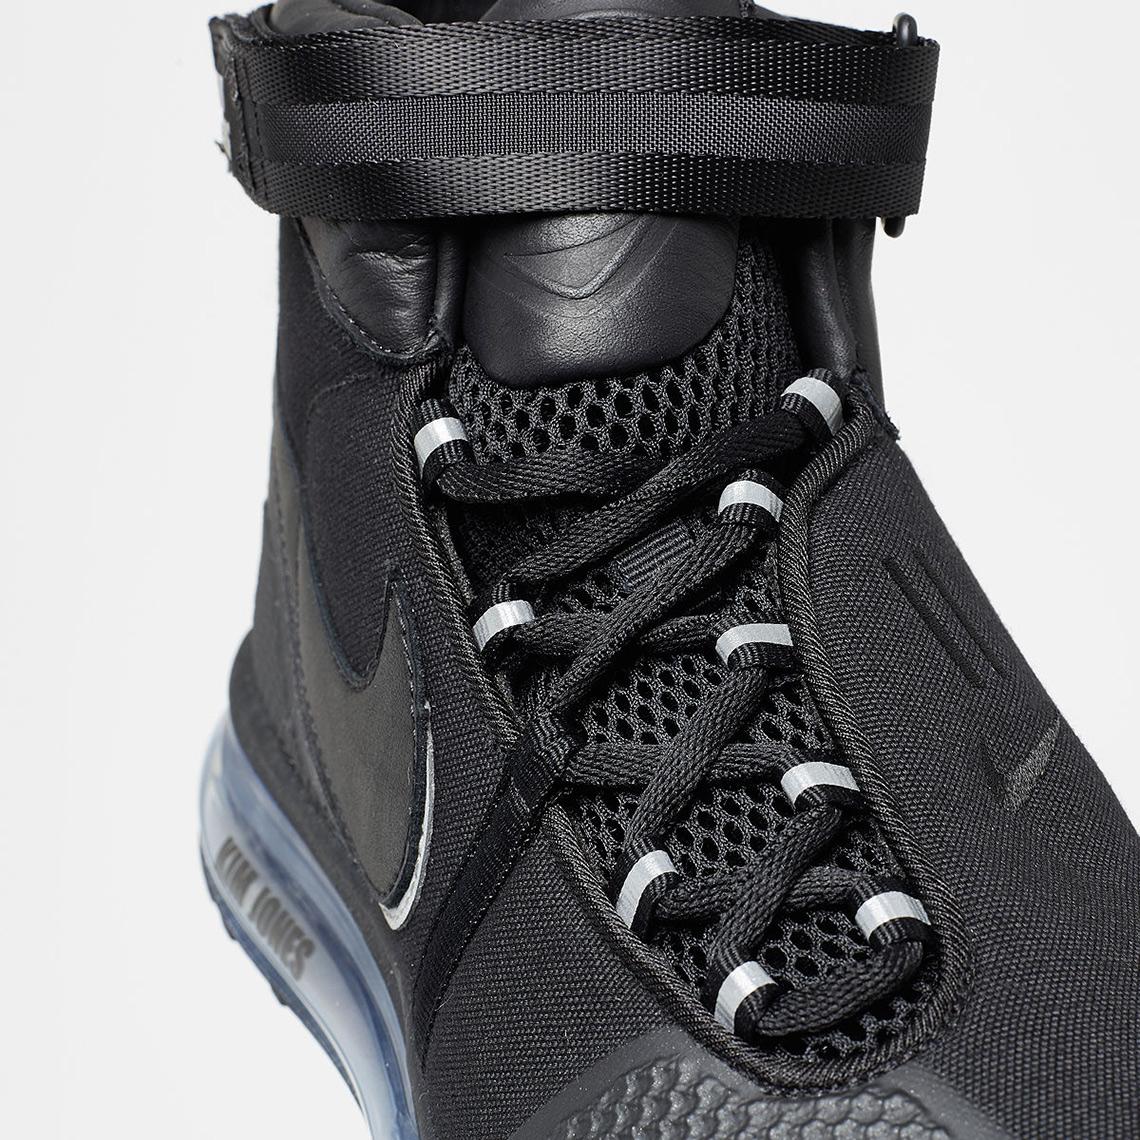 online store e37c6 1b9fe Kim Jones Nike Air Max 360 Hi Top Shoe Release Info   SneakerNews.com